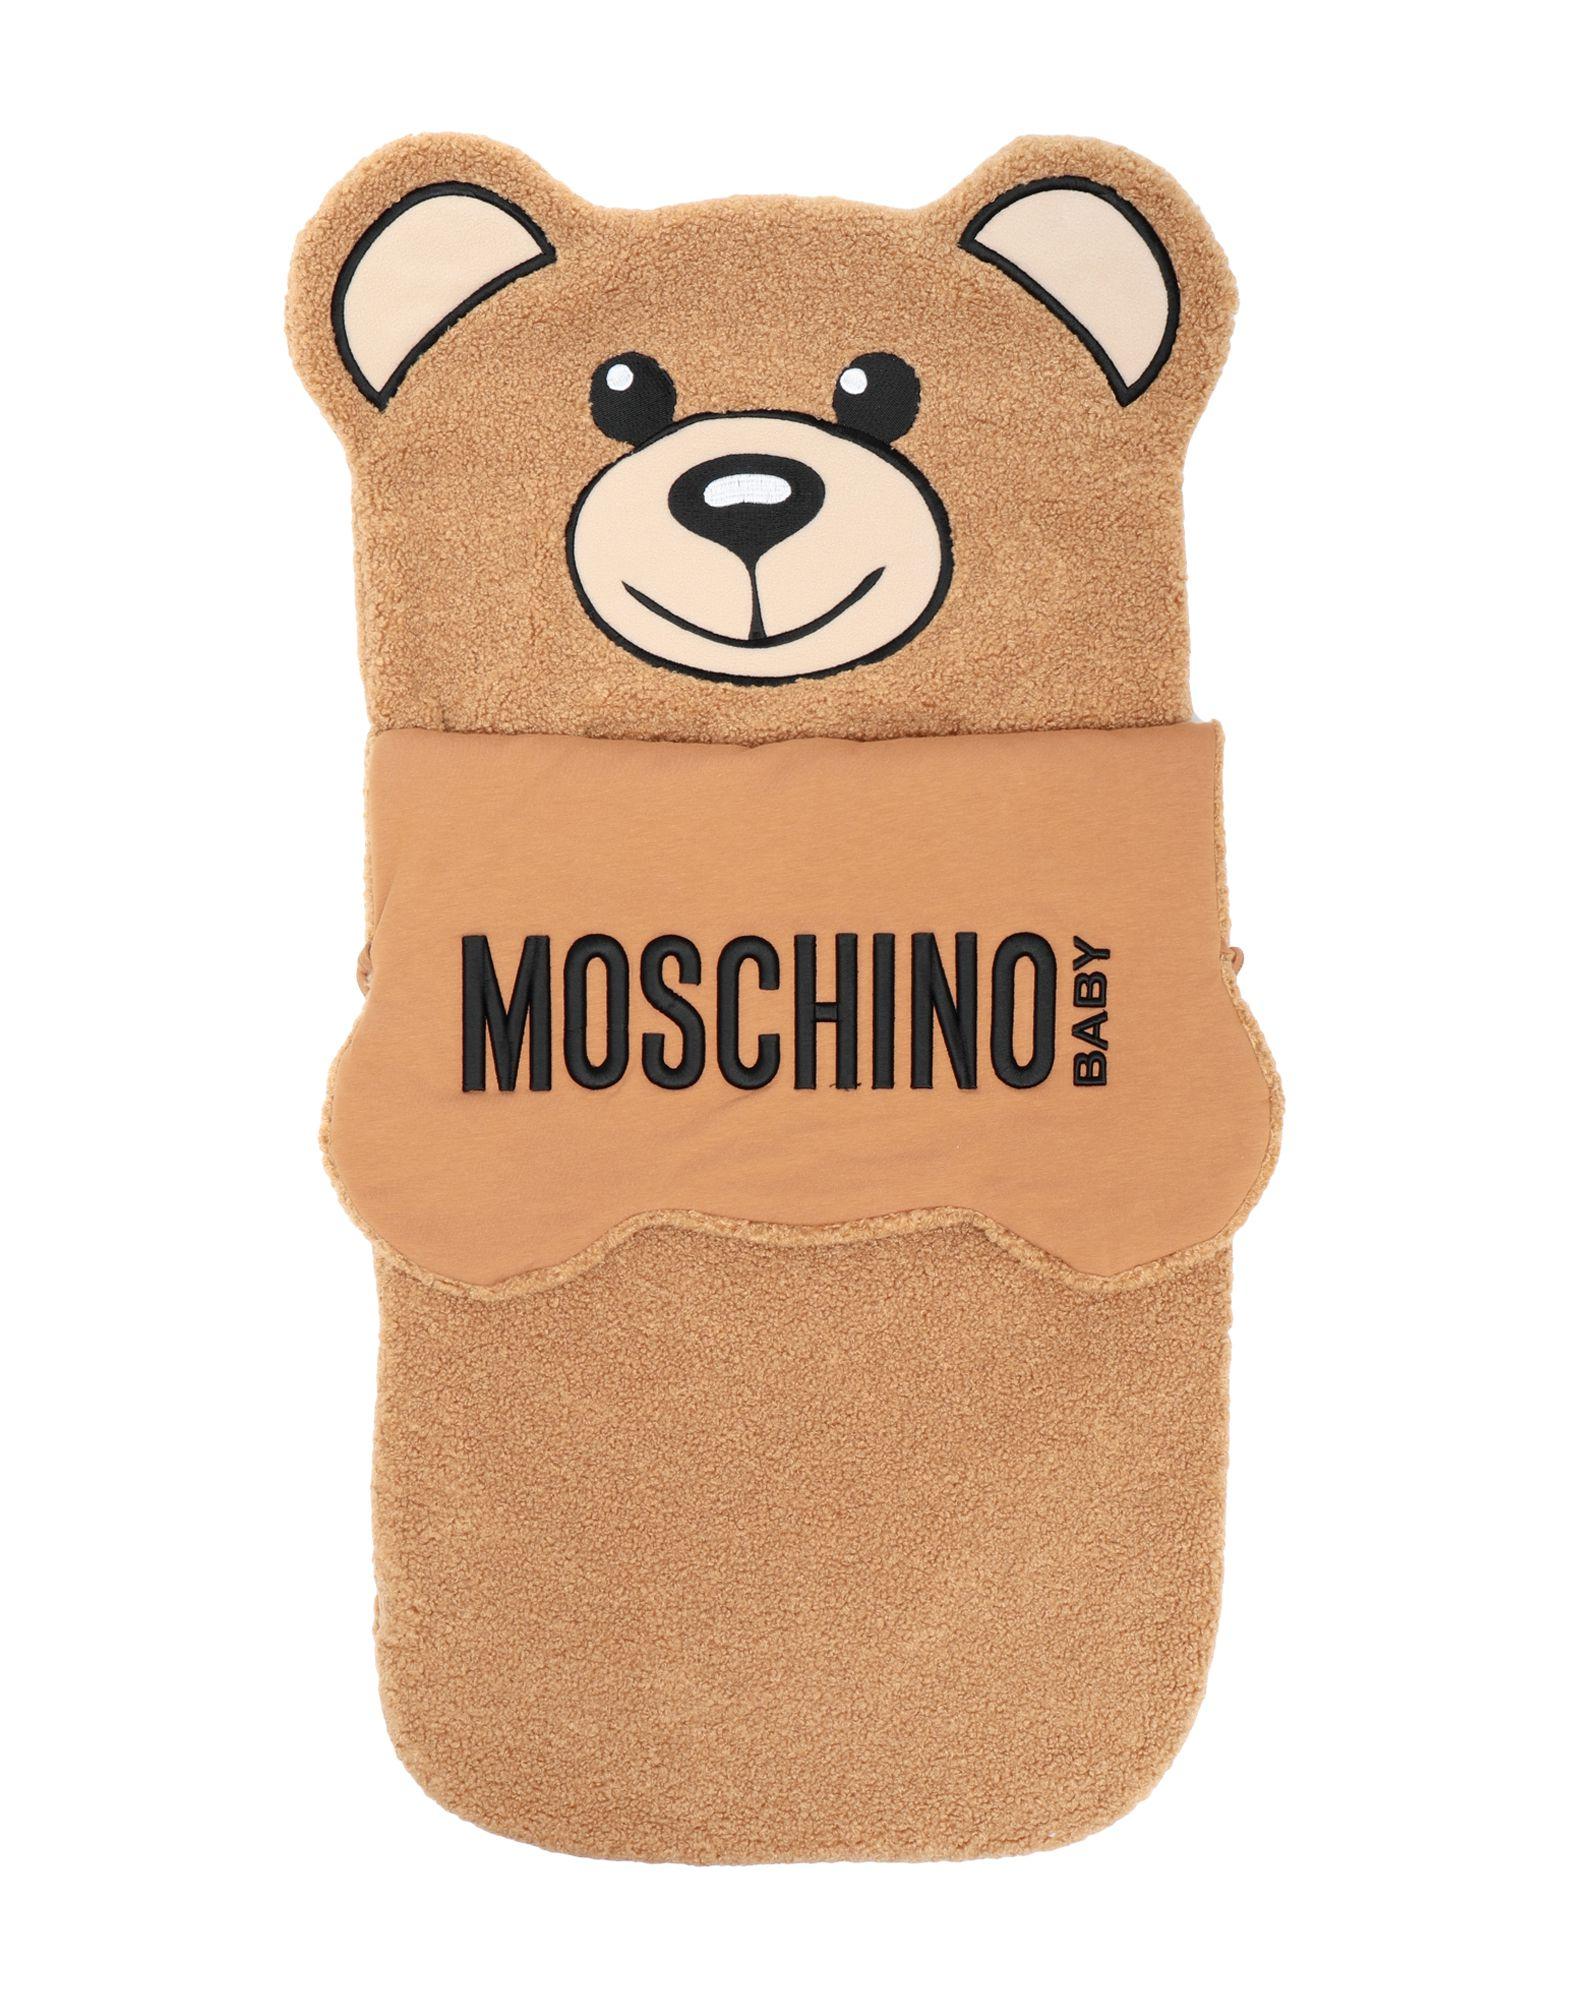 MOSCHINO Одеяльце для младенцев для младенцев от коликов отзывы